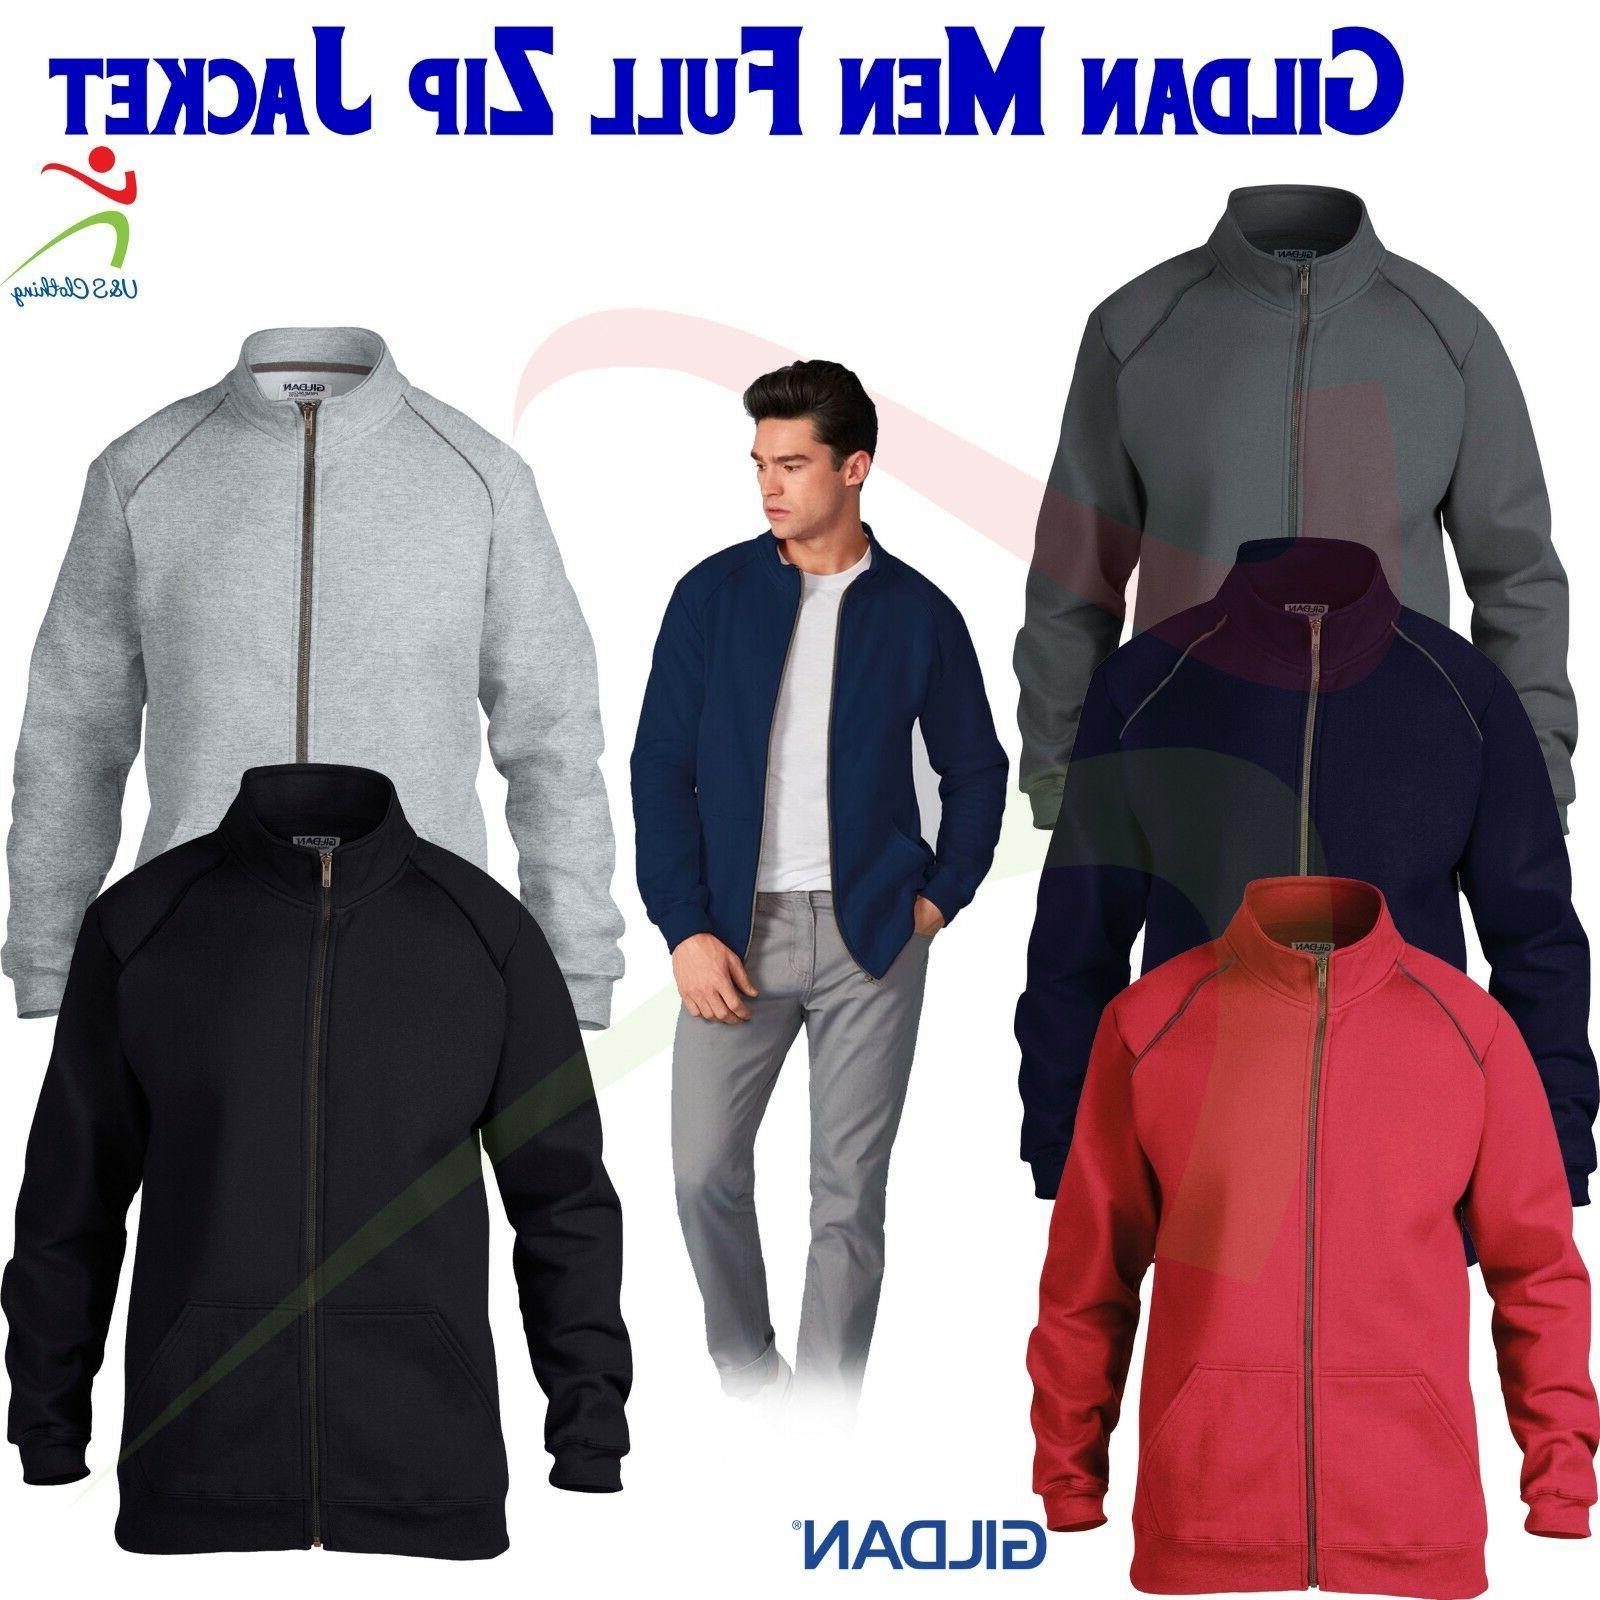 Gildan New Men's Premium Ringspun Cotton Blend Full-Zip Jack